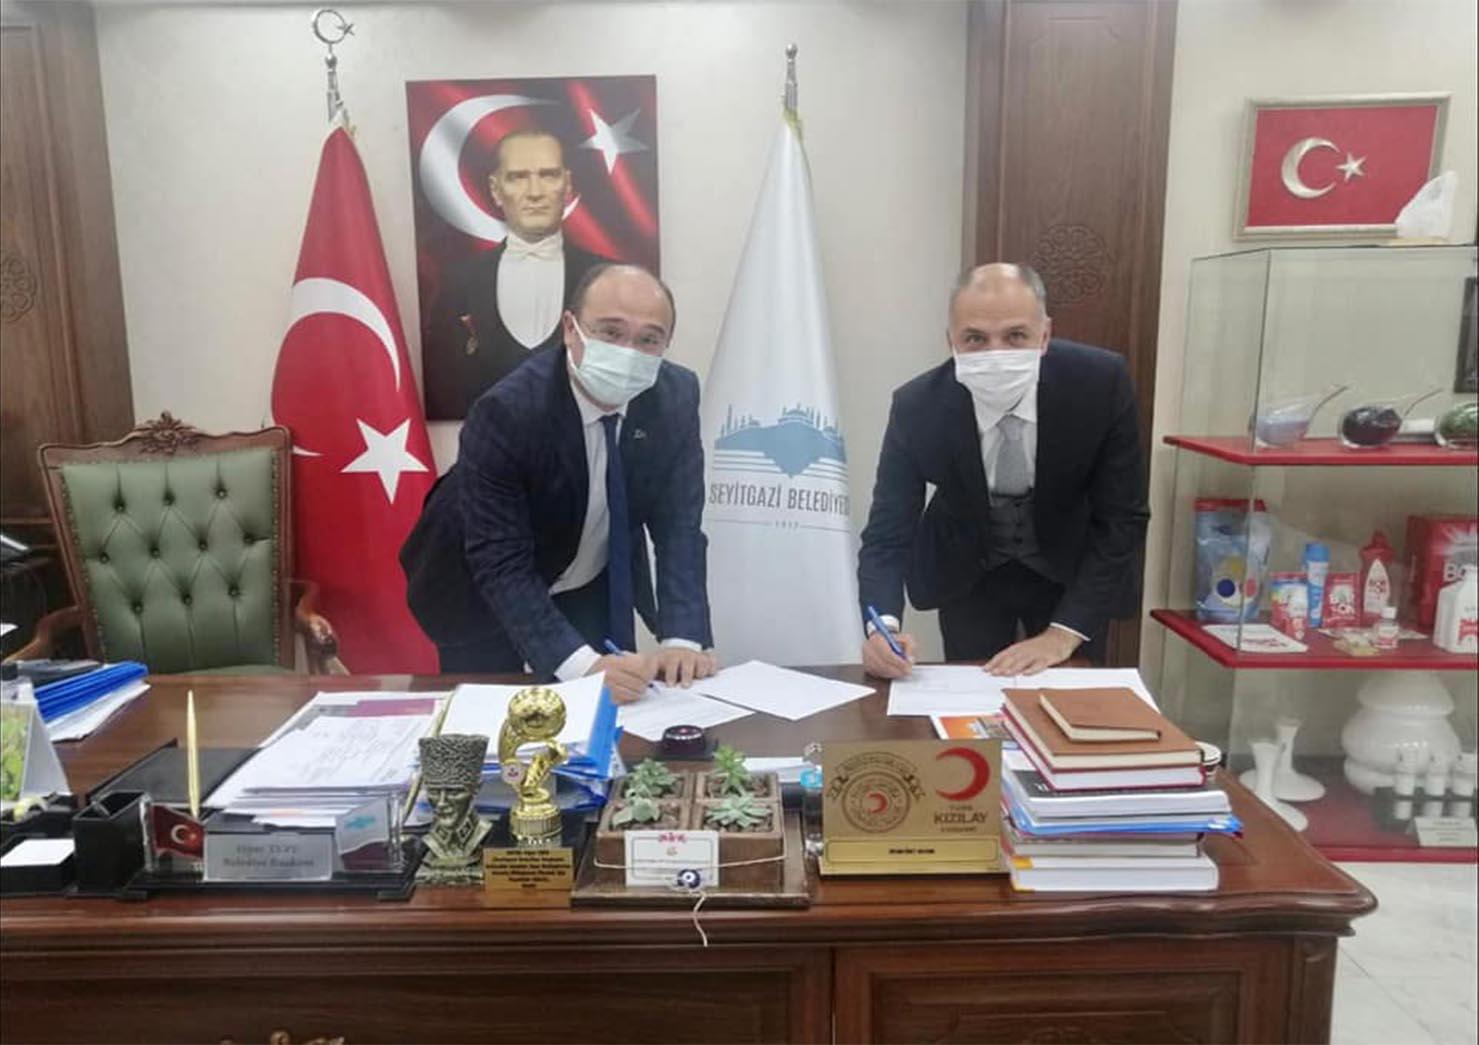 SEYİTGAZİ BELEDİYESİ'NDE MAAŞ ZAMMININ ARDINDAN BANKA PROMOSYONU MÜJDESİ